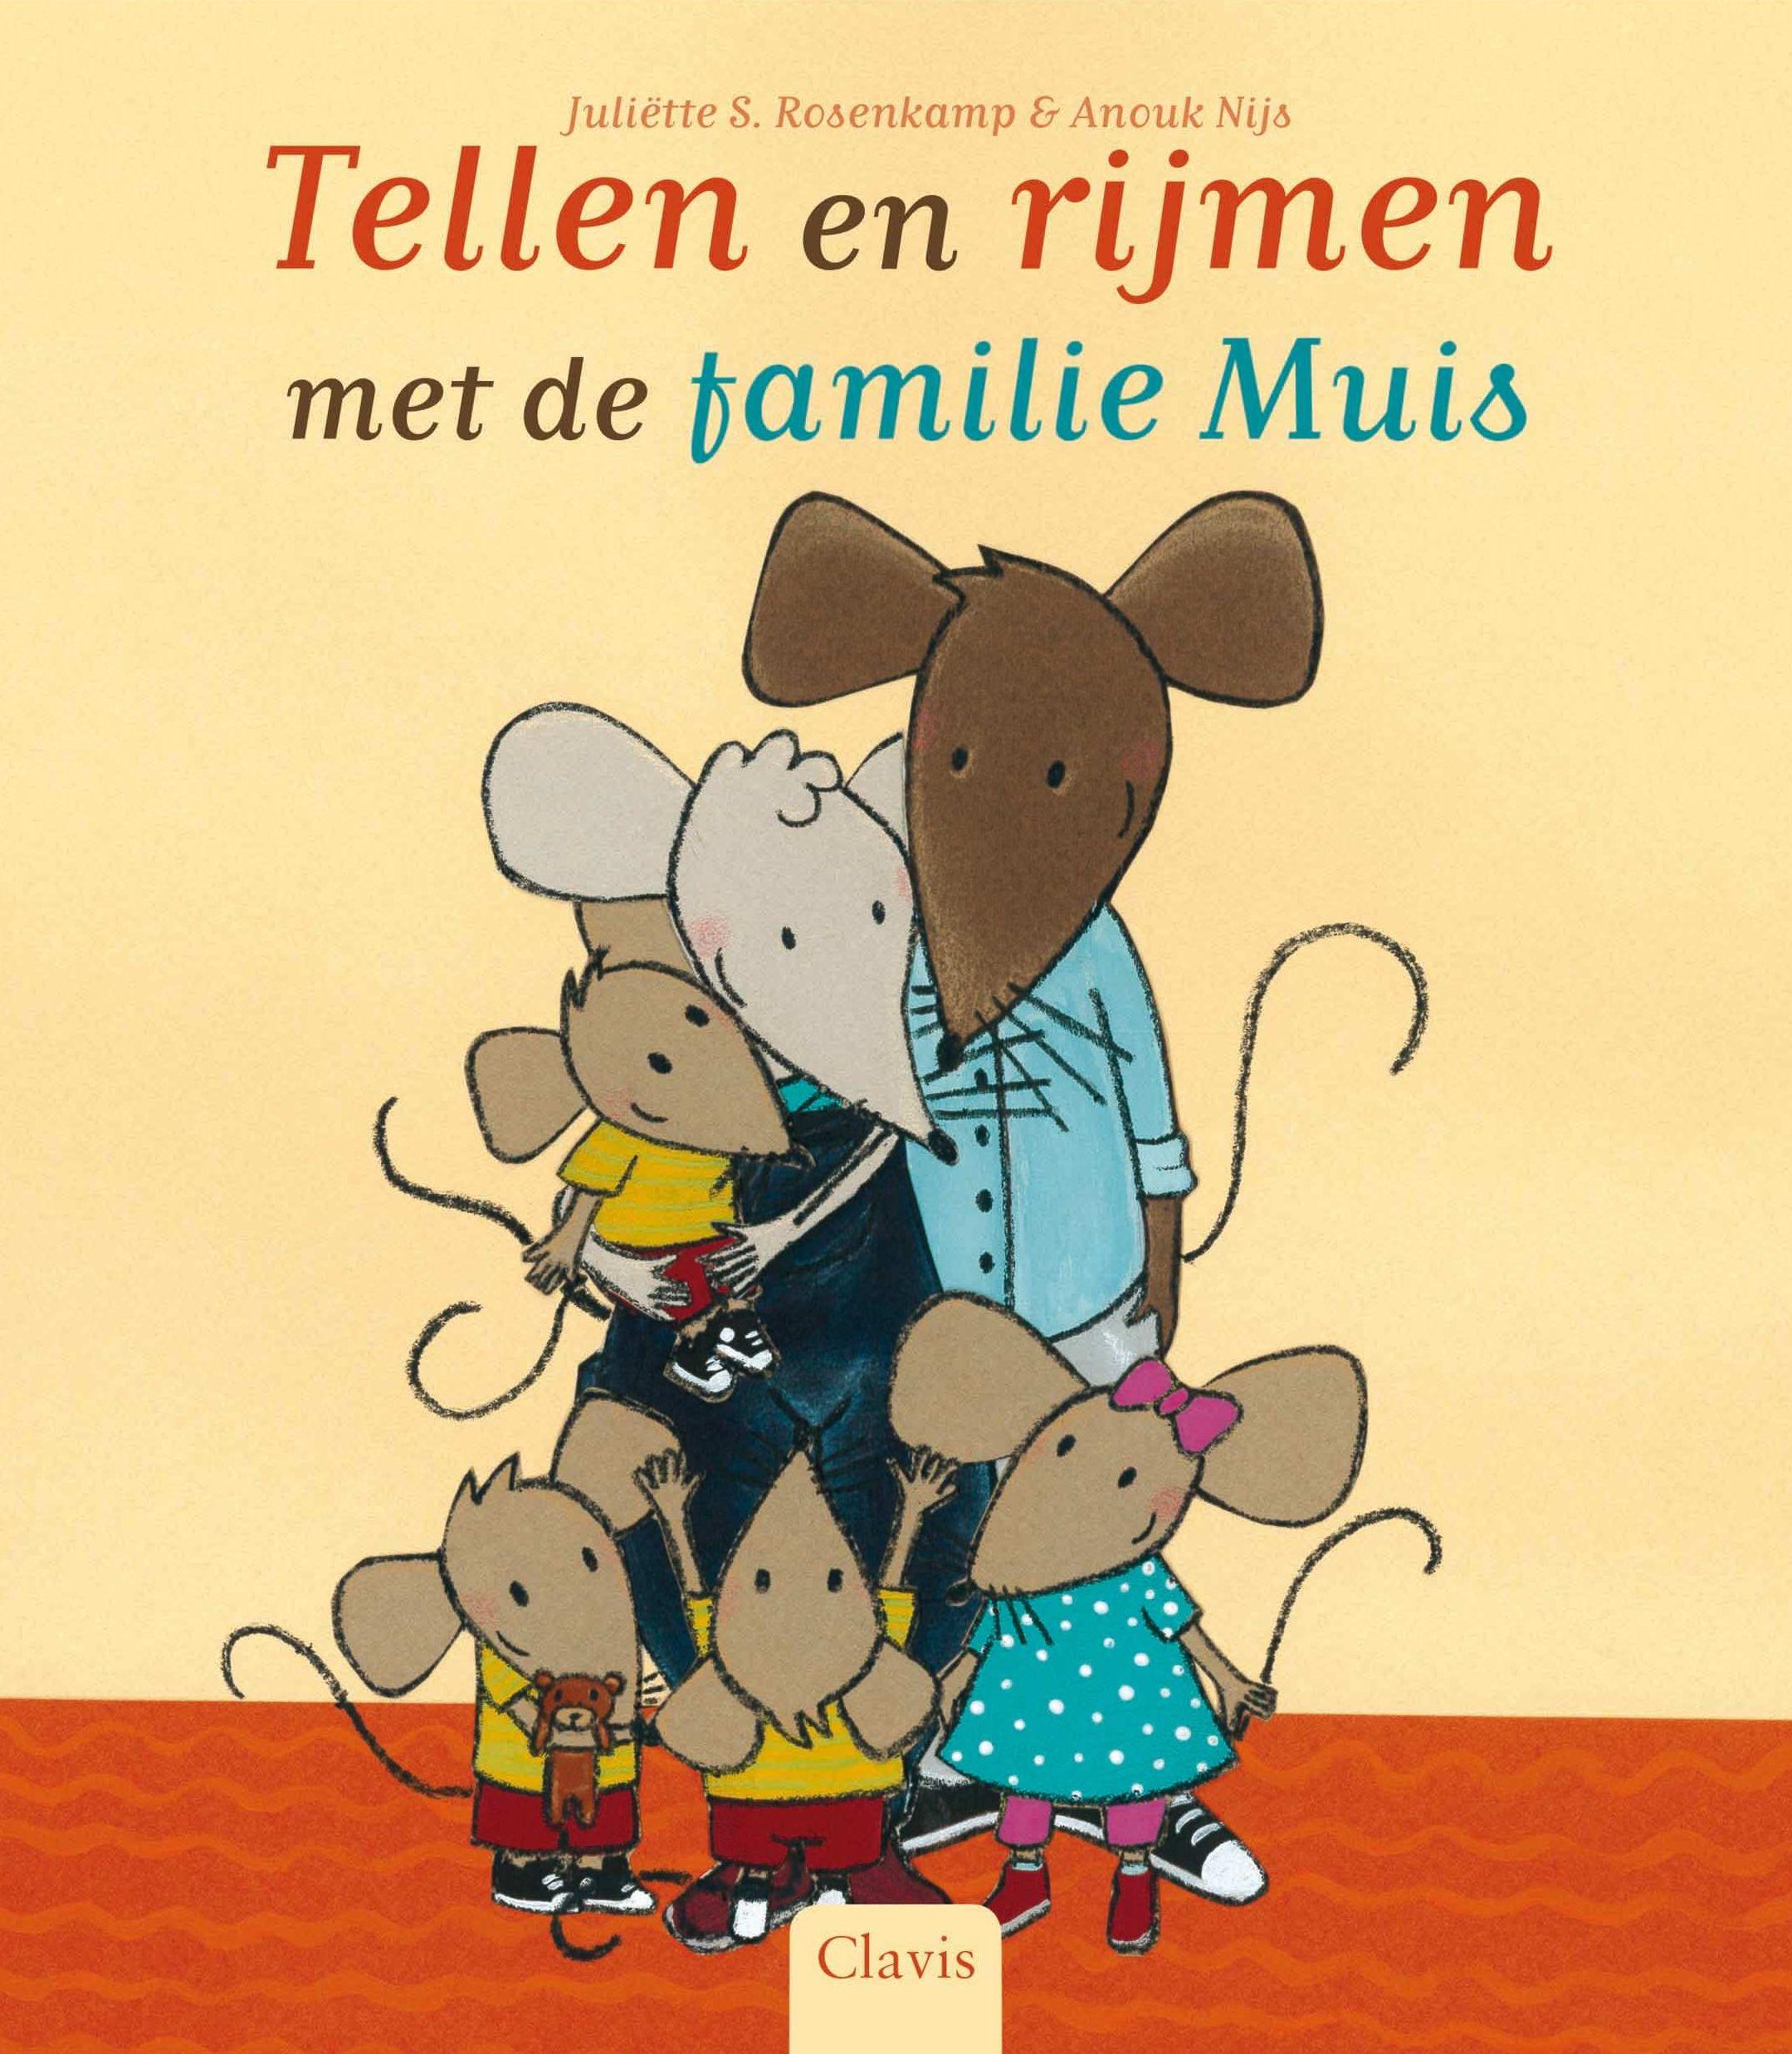 Favoriete Tellen en rijmen met familie Muis – Juliëtte S. Rosenkamp & Anouk @XR38